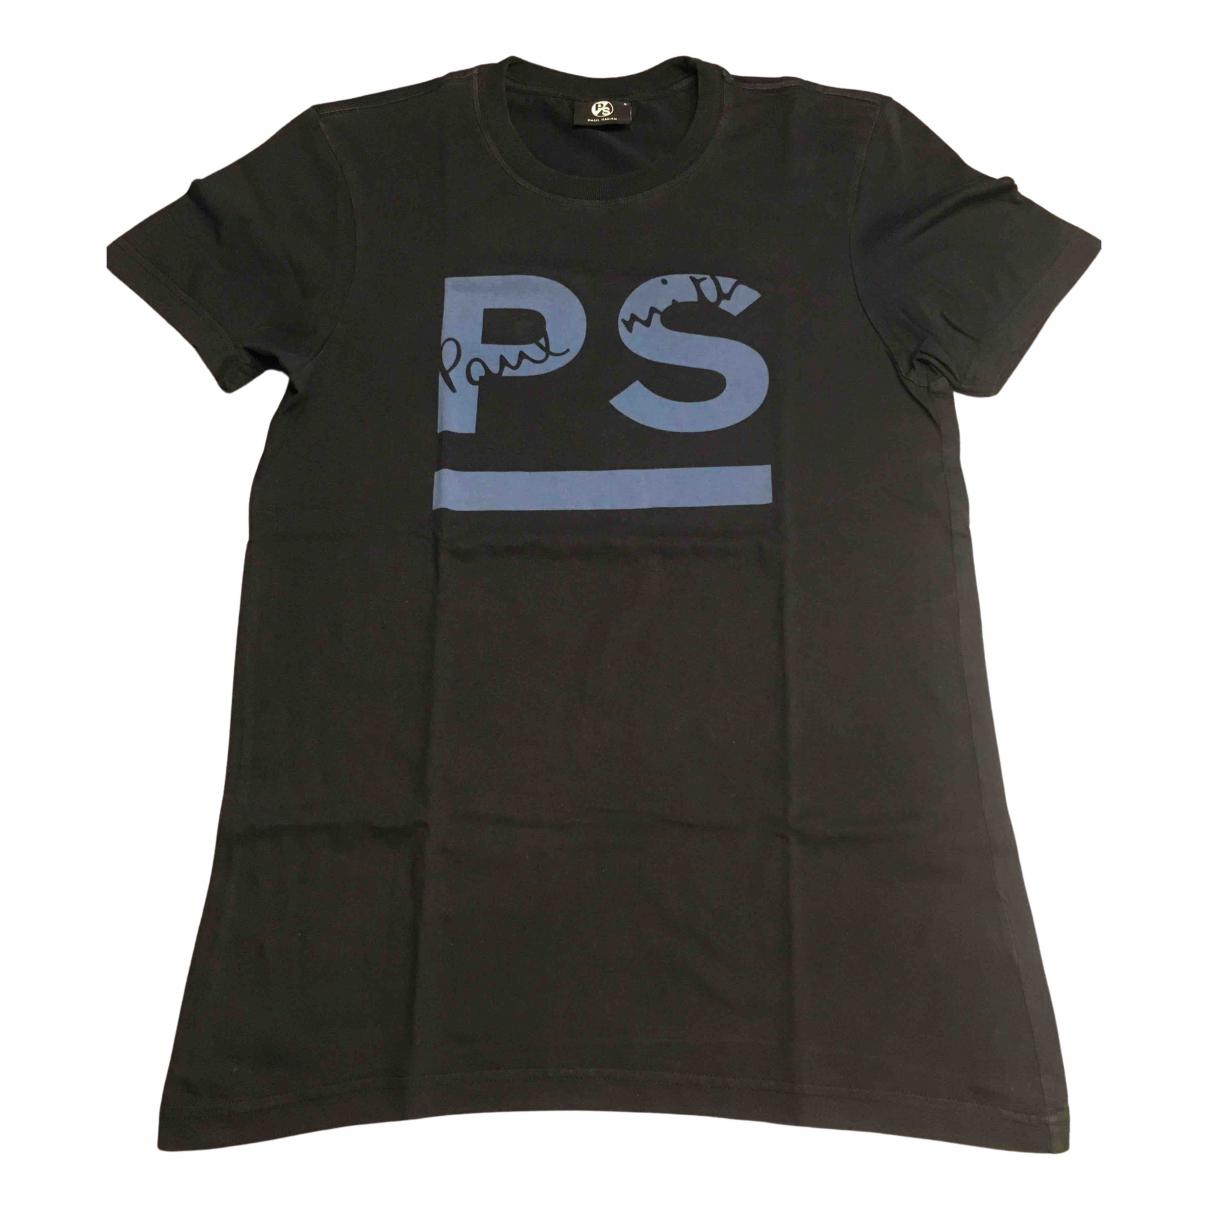 Paul Smith - Tee shirts   pour homme en coton - bleu